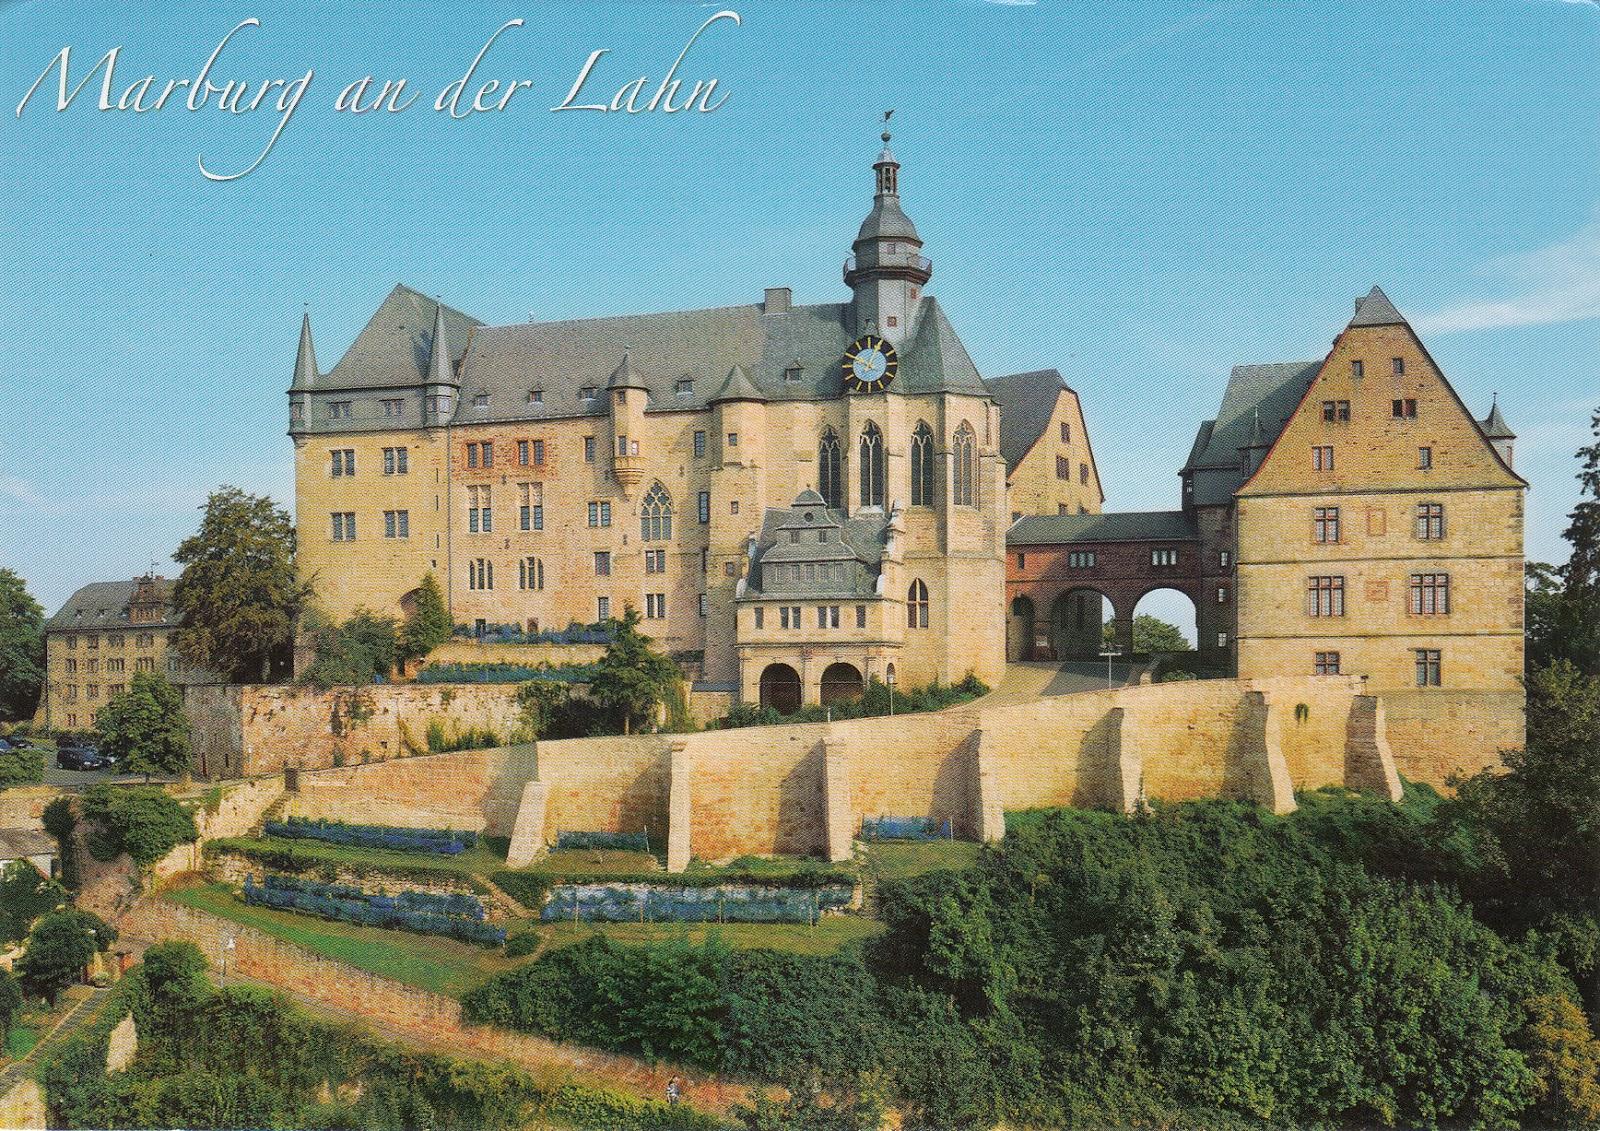 Marburg colloquy